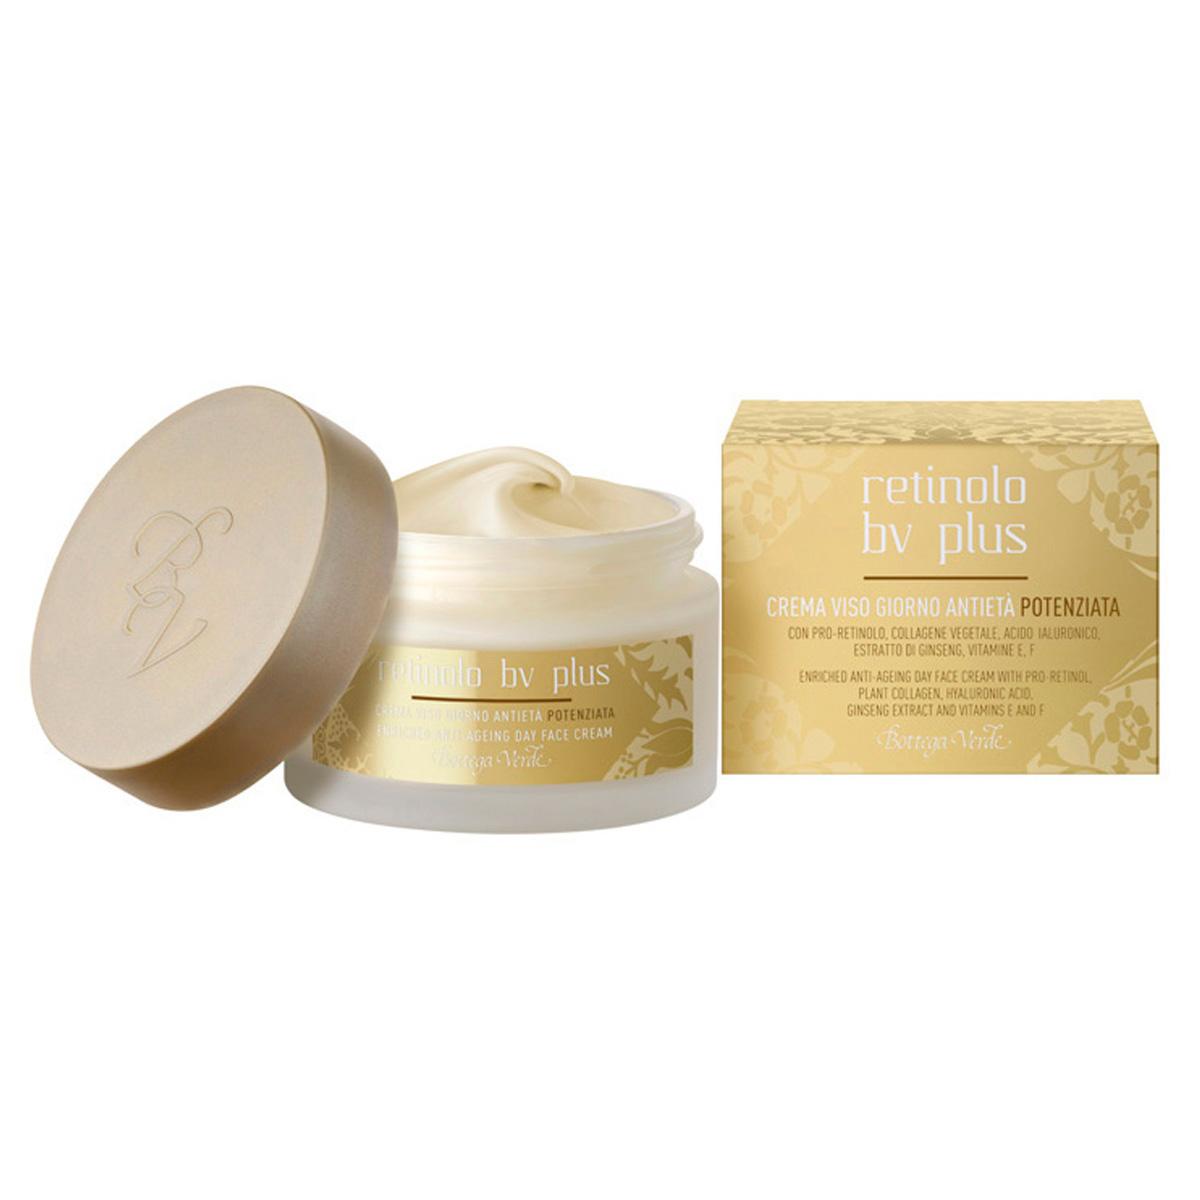 Retinolo Bv Plus - Crema de fata pentru zi , anti-aging cu Pro-Retinol, Colagen vegetal, acid hialuronic, extract de Ginseng, Vitamine E, F